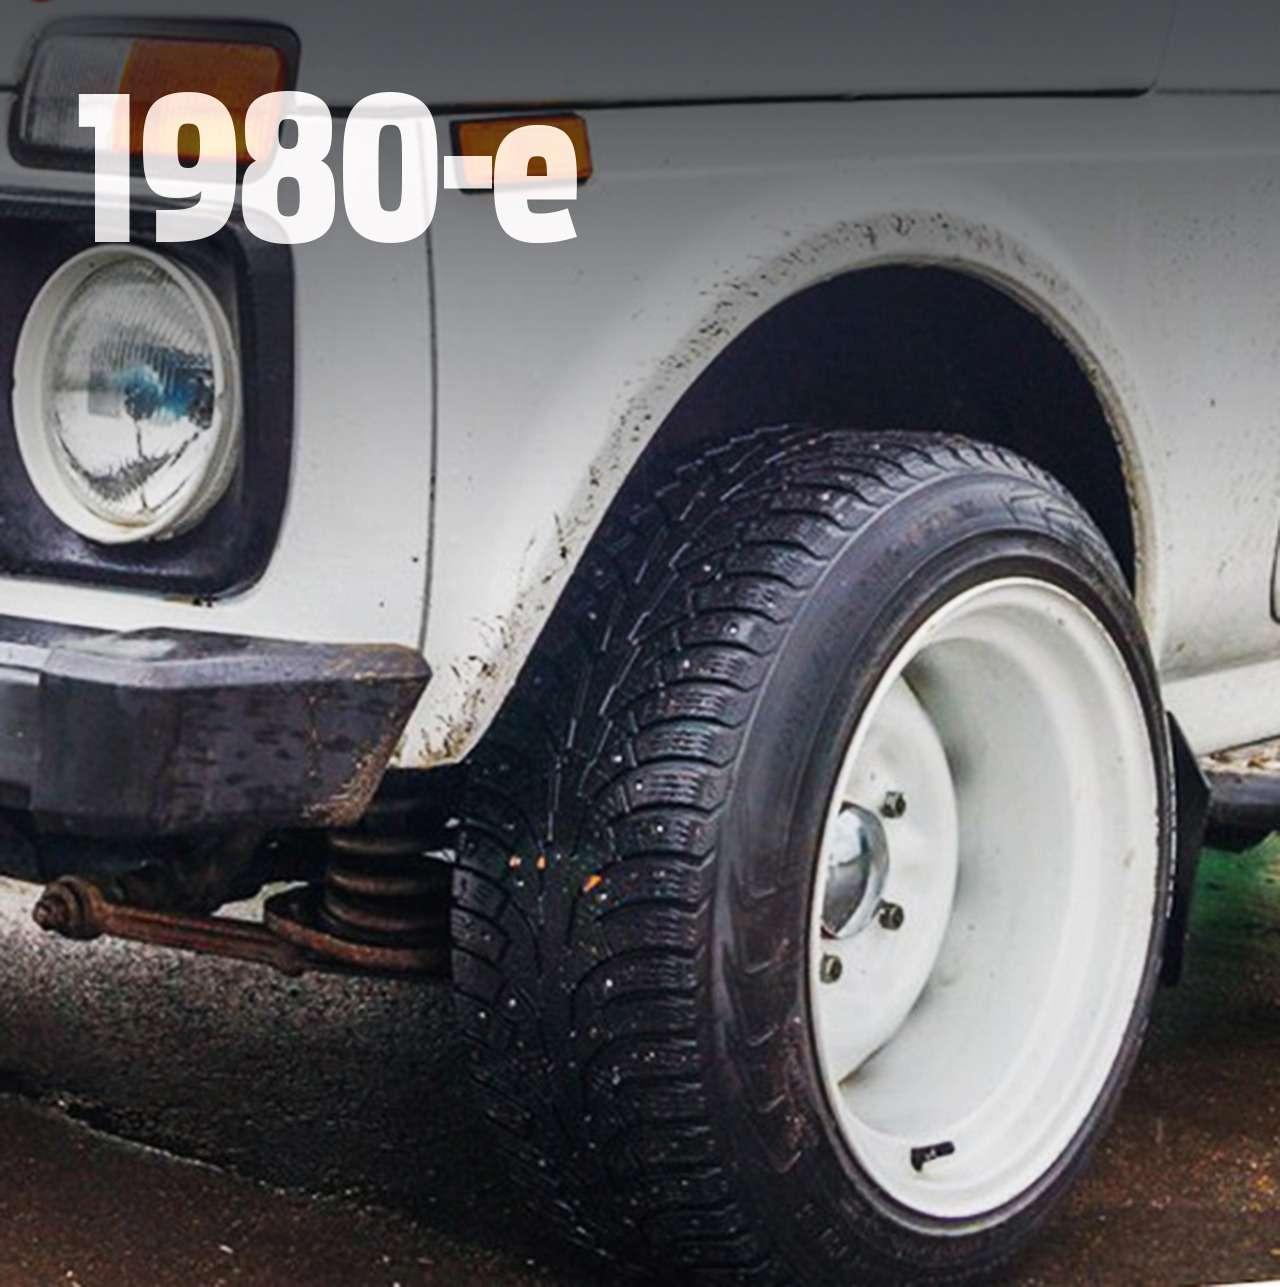 Тюнинг по-русски: отоплеток 60-х годов досиних писалок